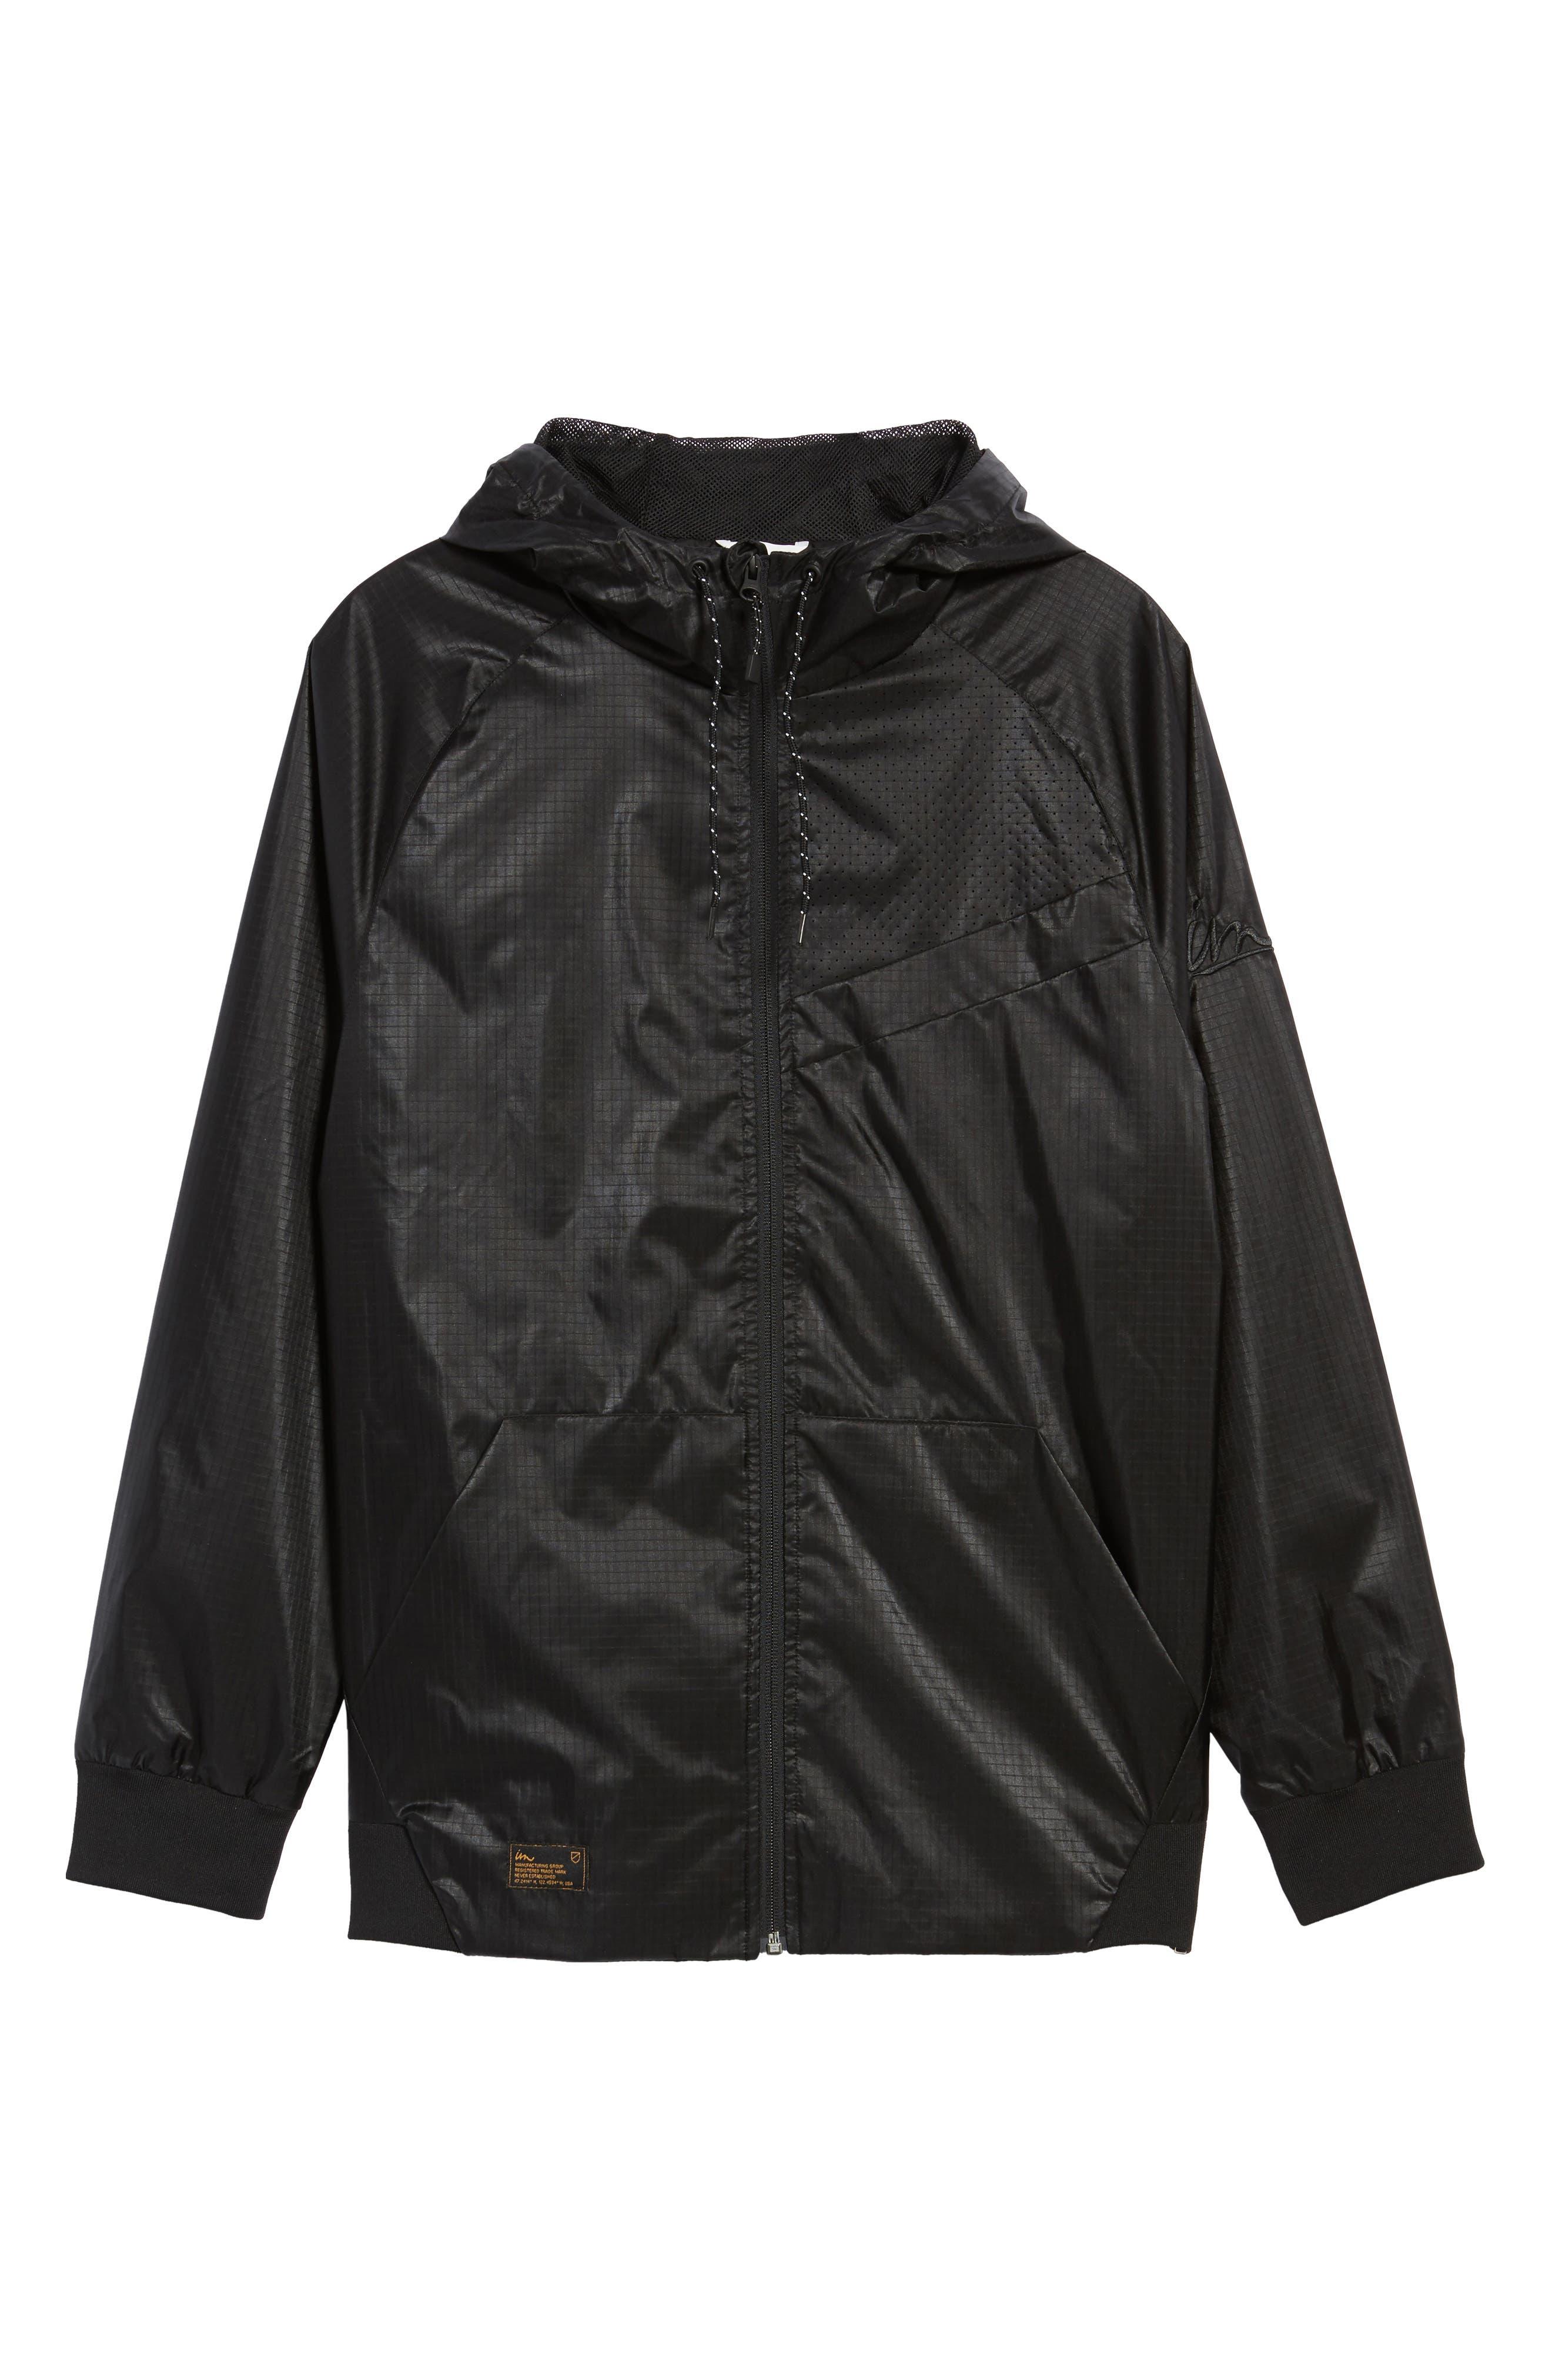 NCT Welder Jacket,                             Alternate thumbnail 5, color,                             001